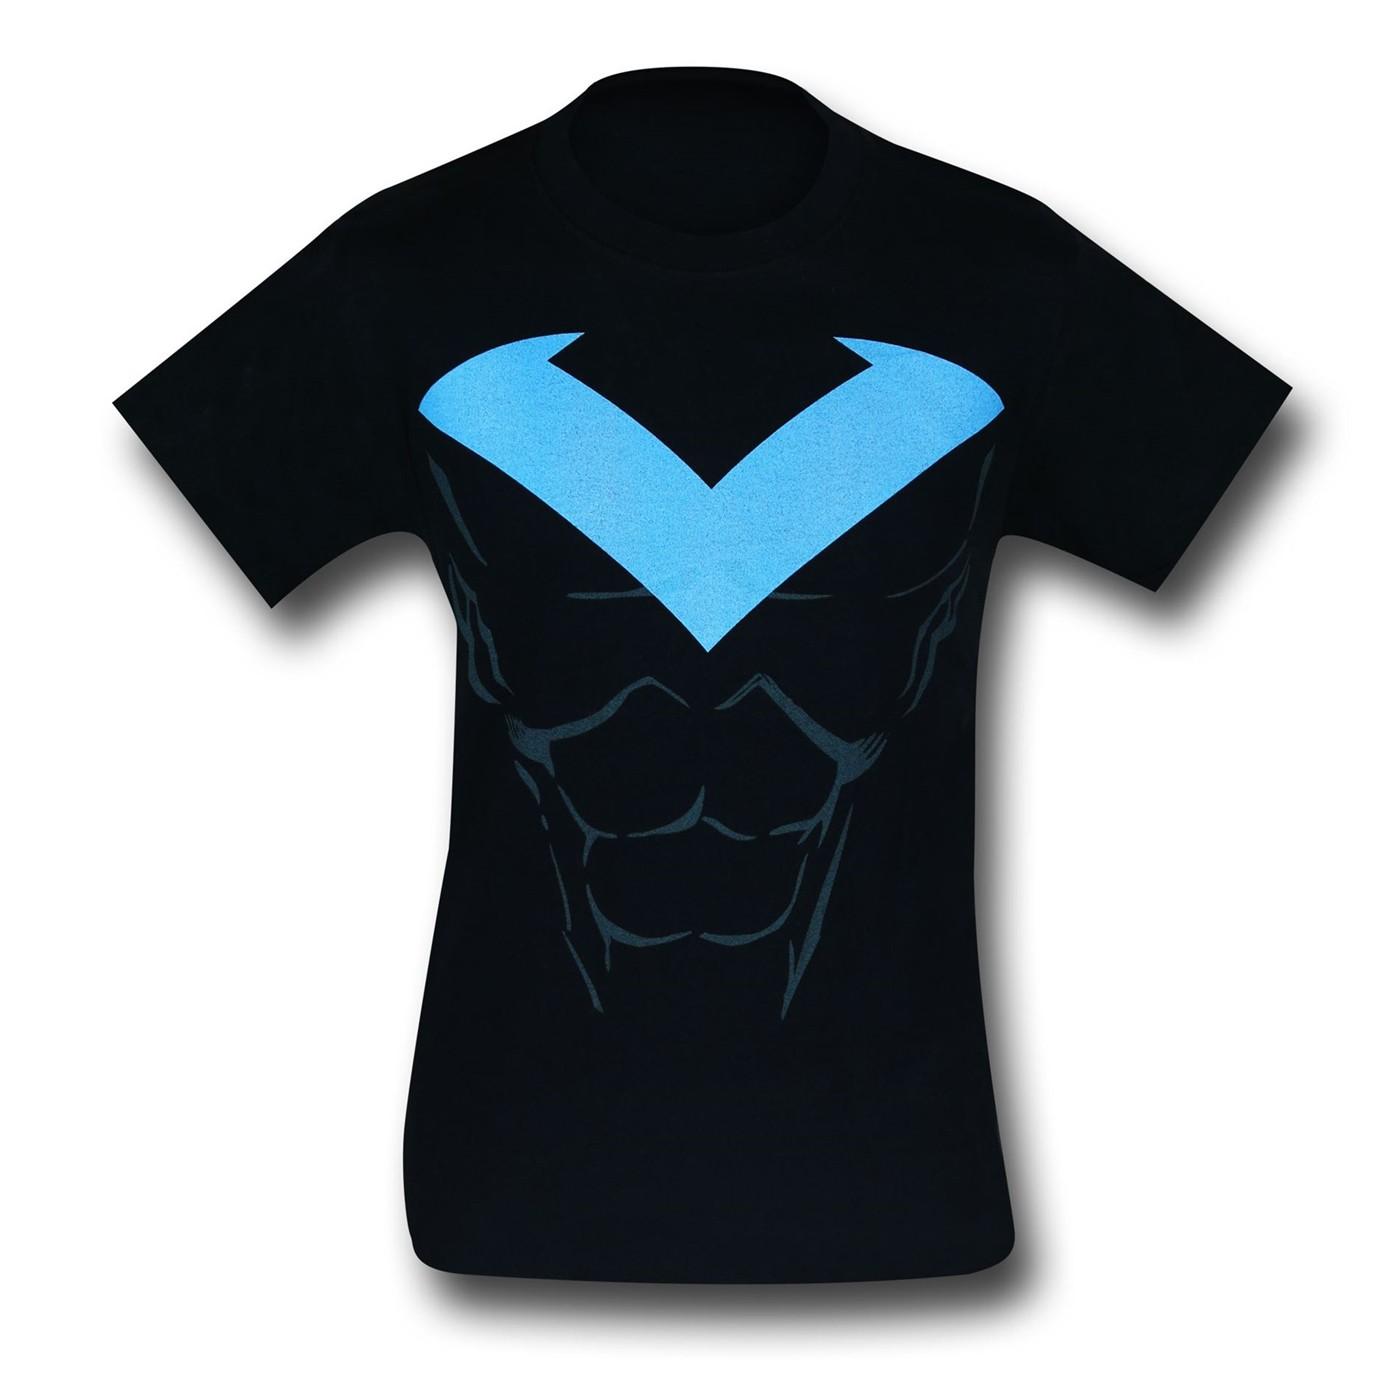 Nightwing Costume T-Shirt